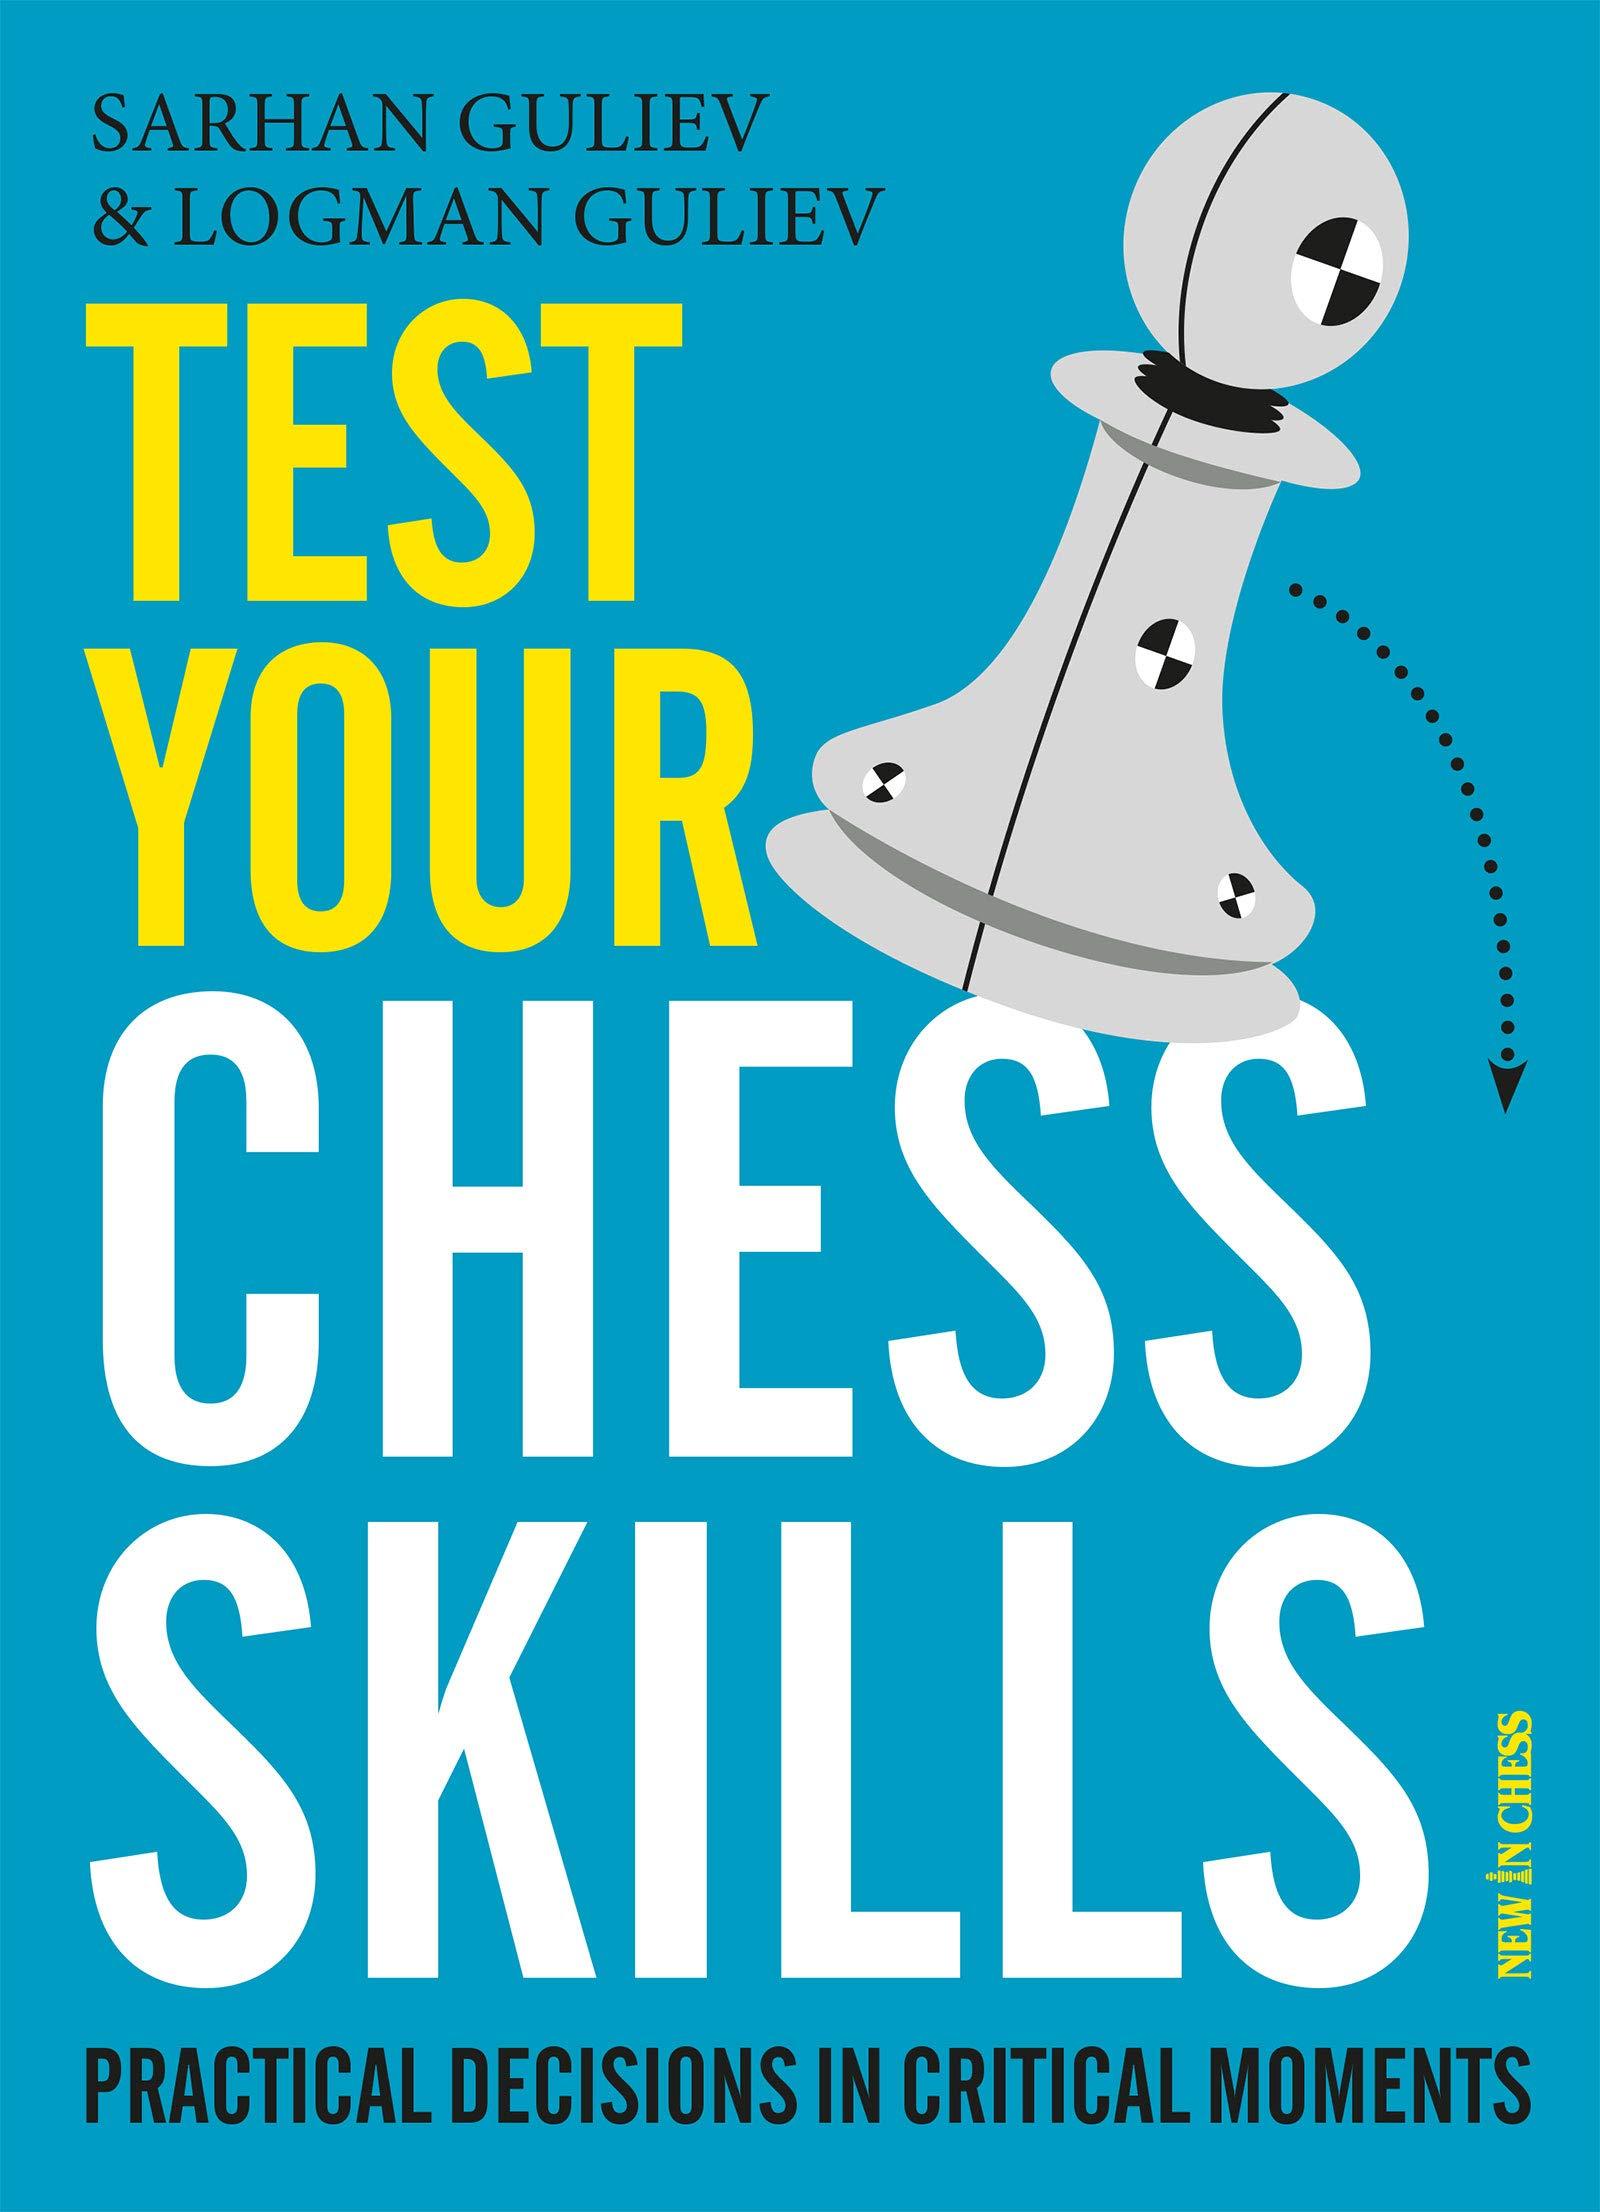 Test your chess skills by Sarhan & Logman Guliev 71MWsvNgGeL